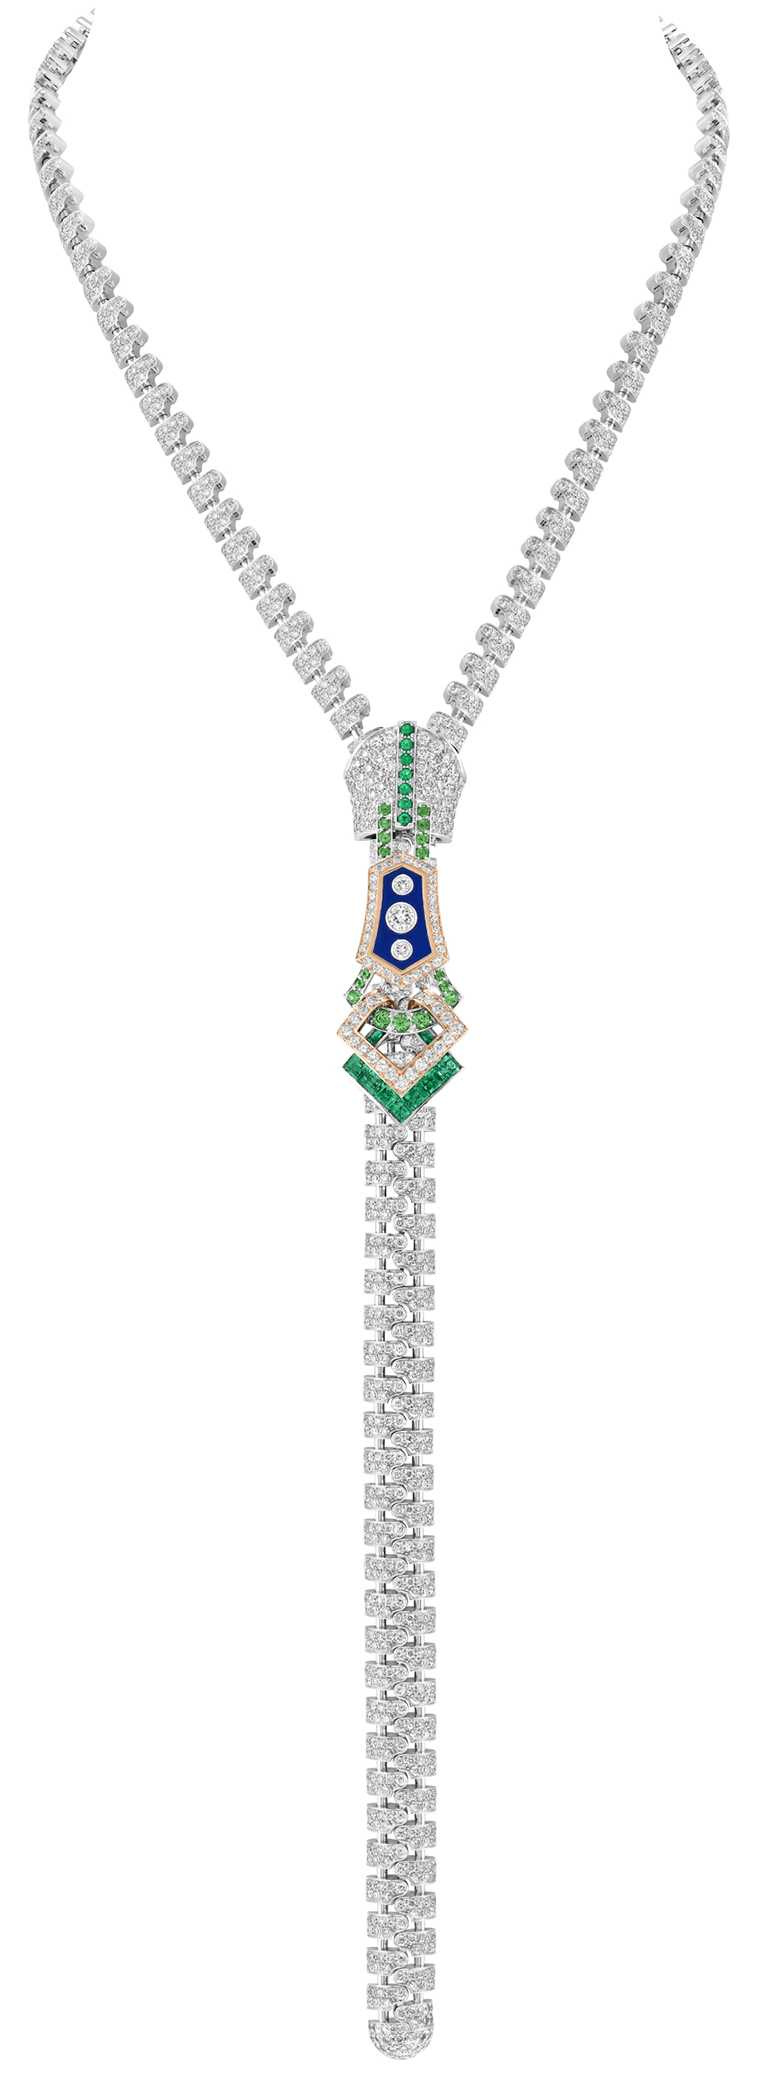 Van Cleef & Arpels「Zip Couture Delicate Buttons項鍊」,白K金、玫瑰金、祖母綠、沙弗萊石、青金石、鑽石,近日內即將抵台展示。(圖╱Van Cleef & Arpels提供)